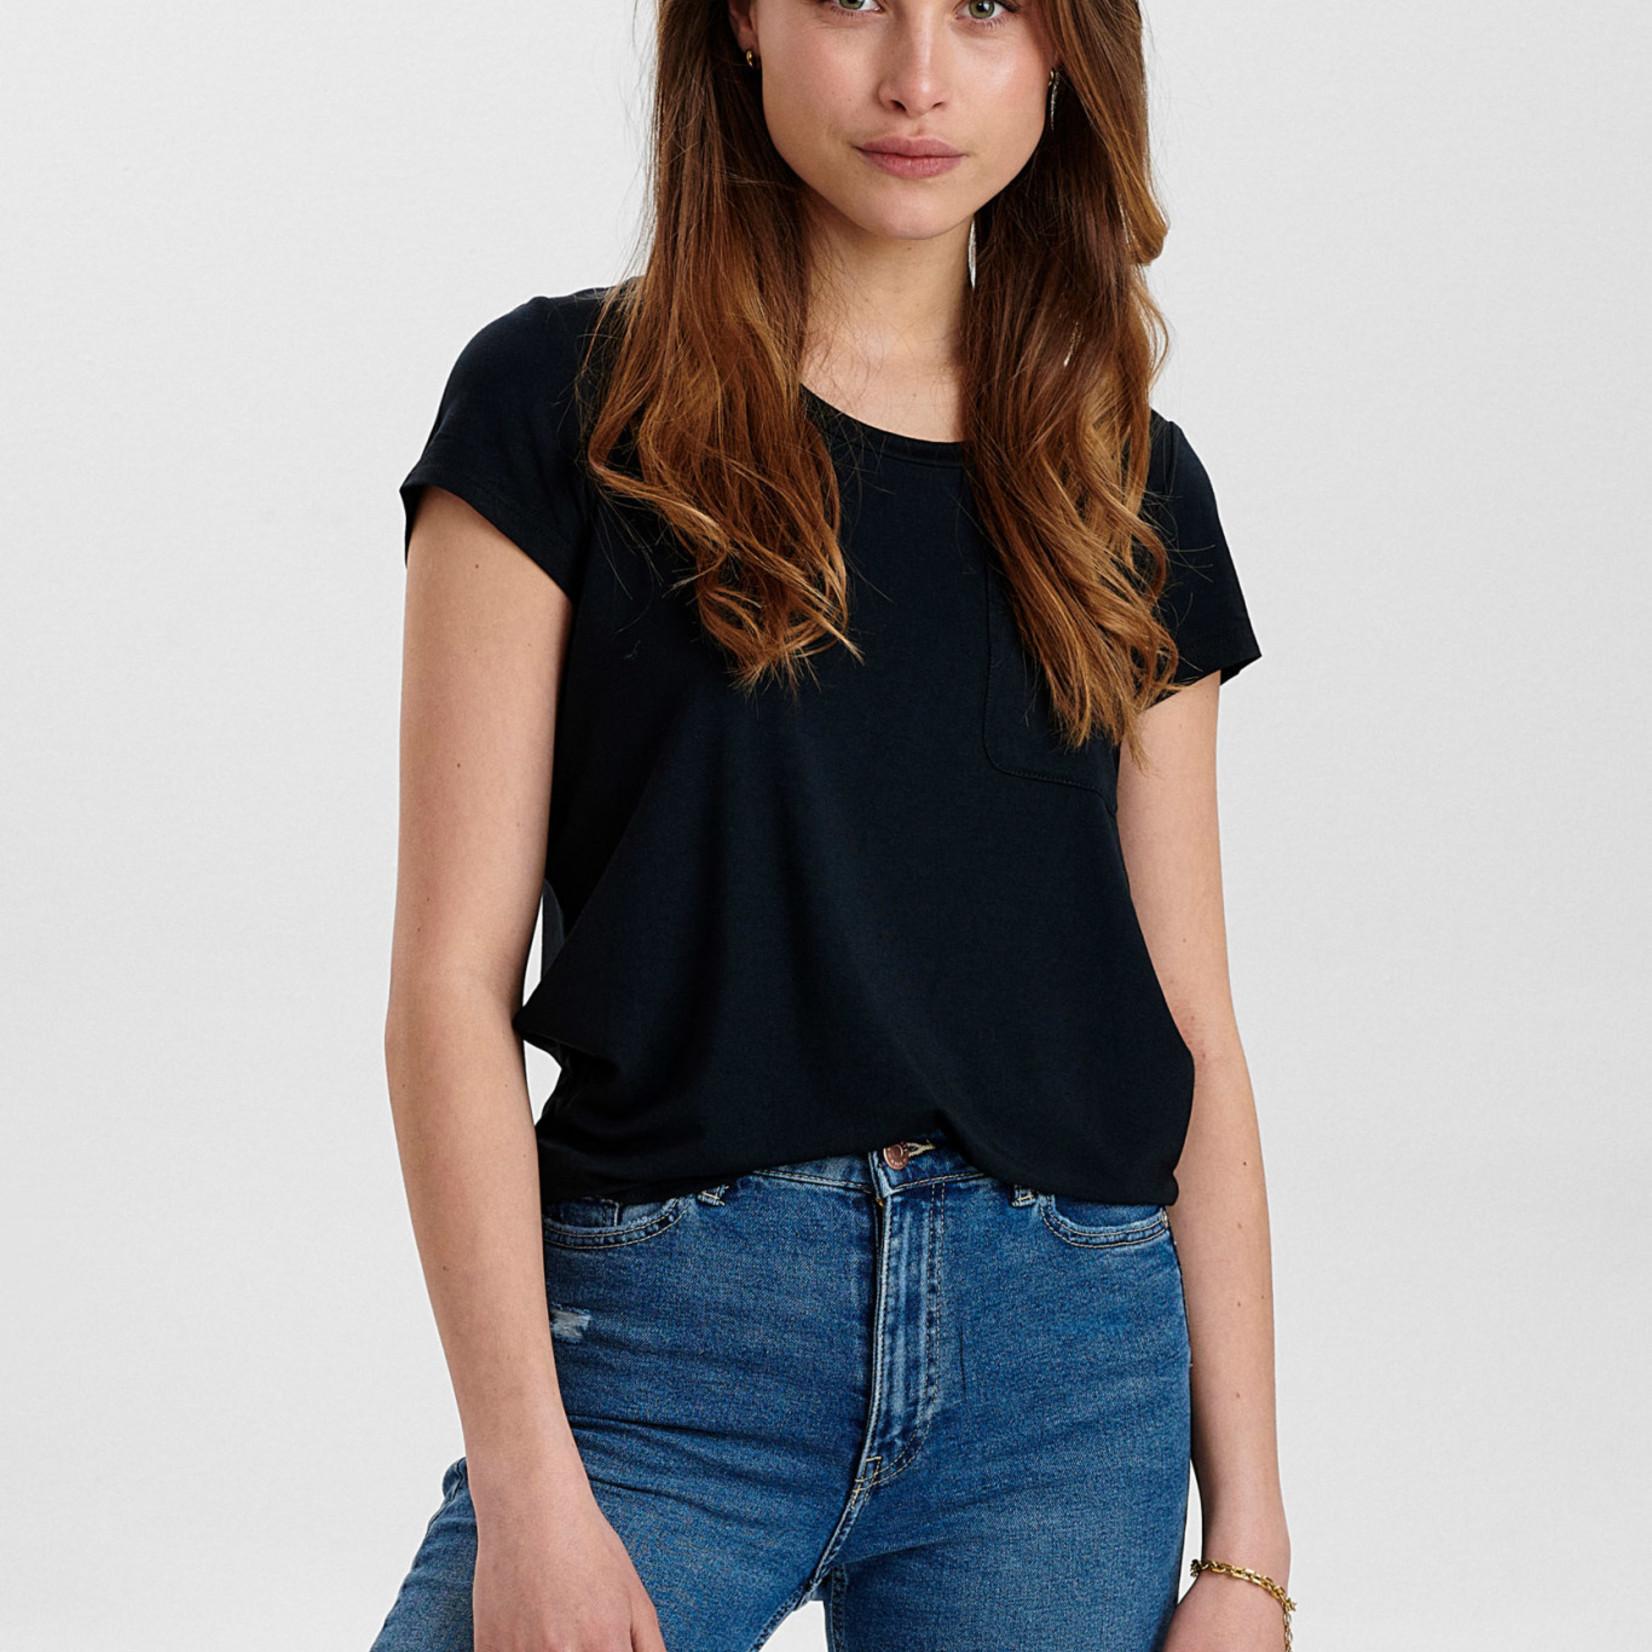 NÜMPH NUBOWIE, t-shirt met borstzakje